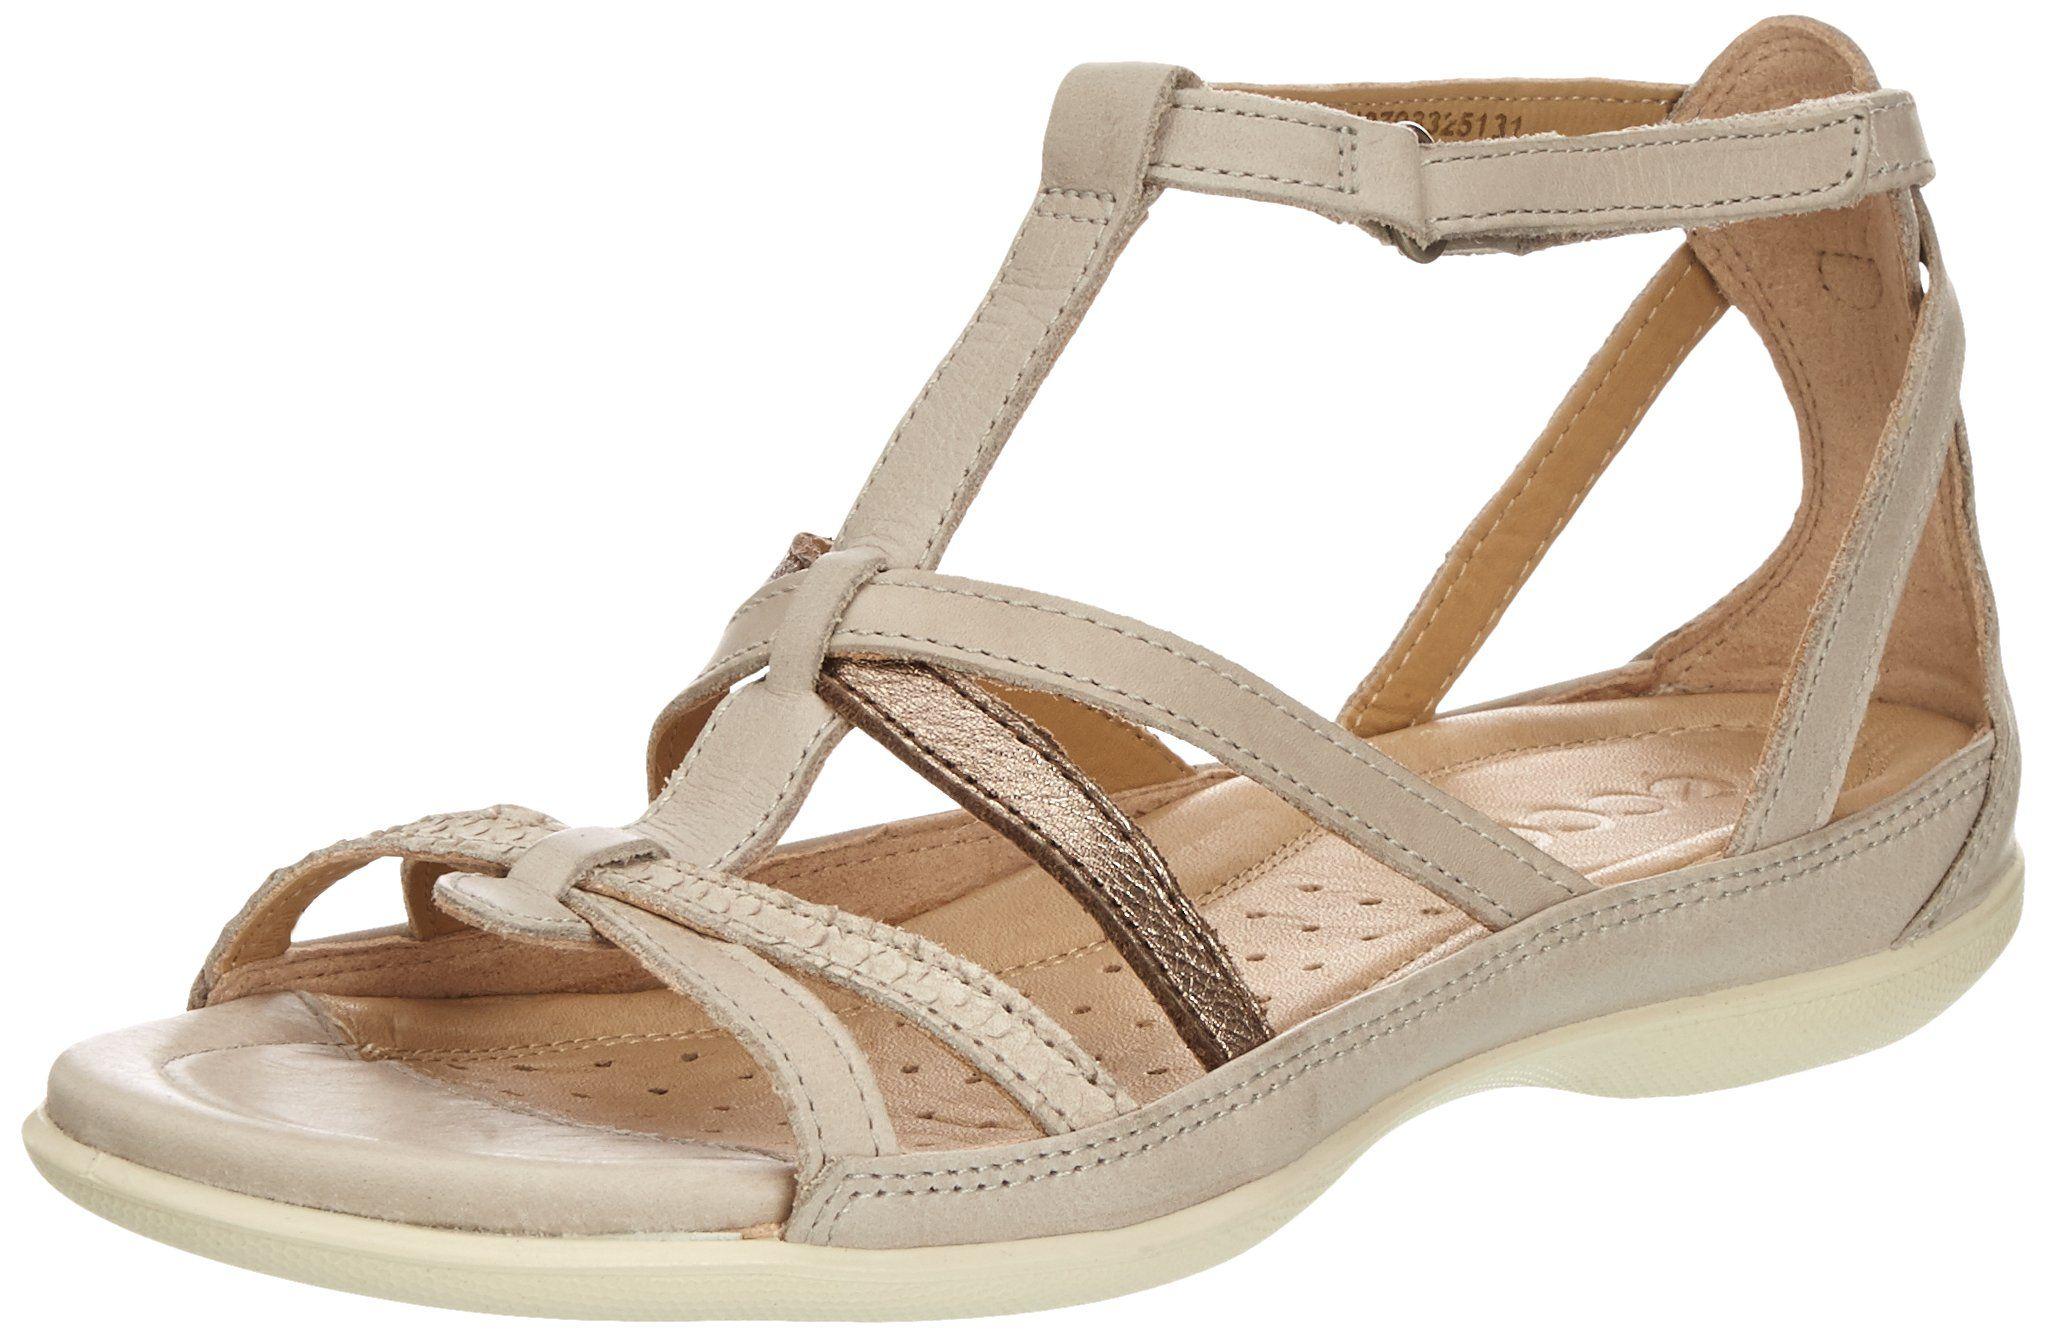 Ecco flash t strap sandal + FREE SHIPPING |